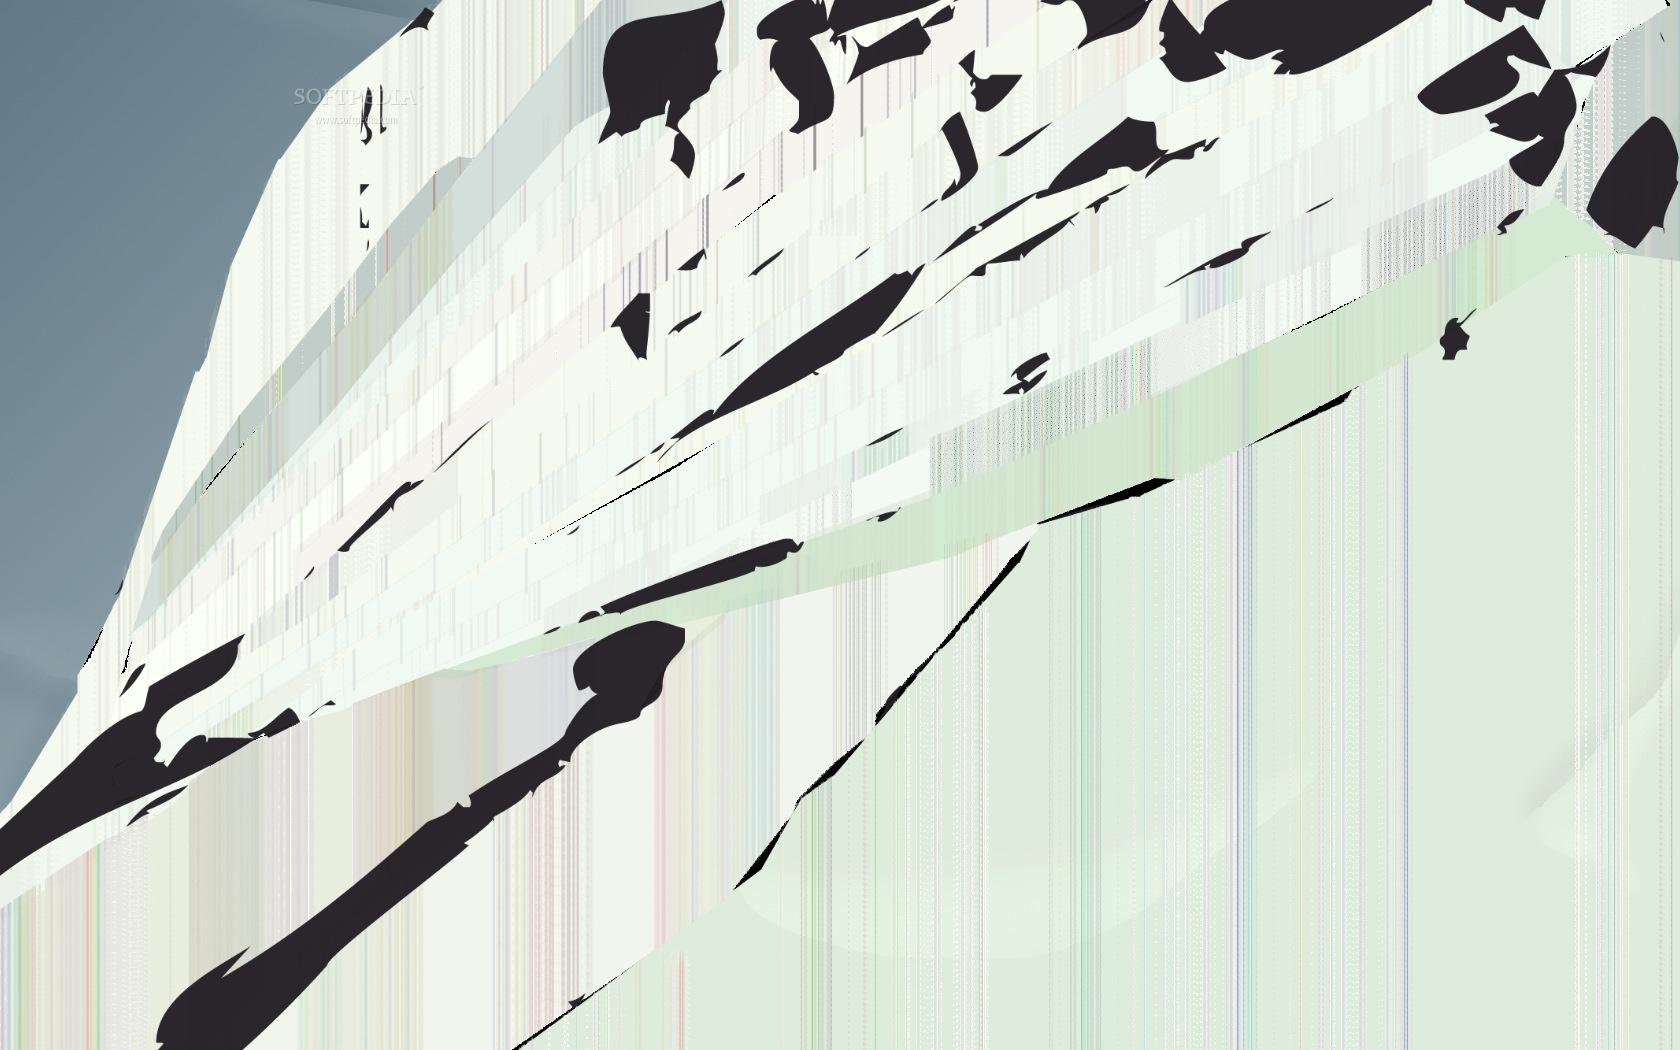 cracked tv screen prank wallpaper 62 images - HD1680×1050